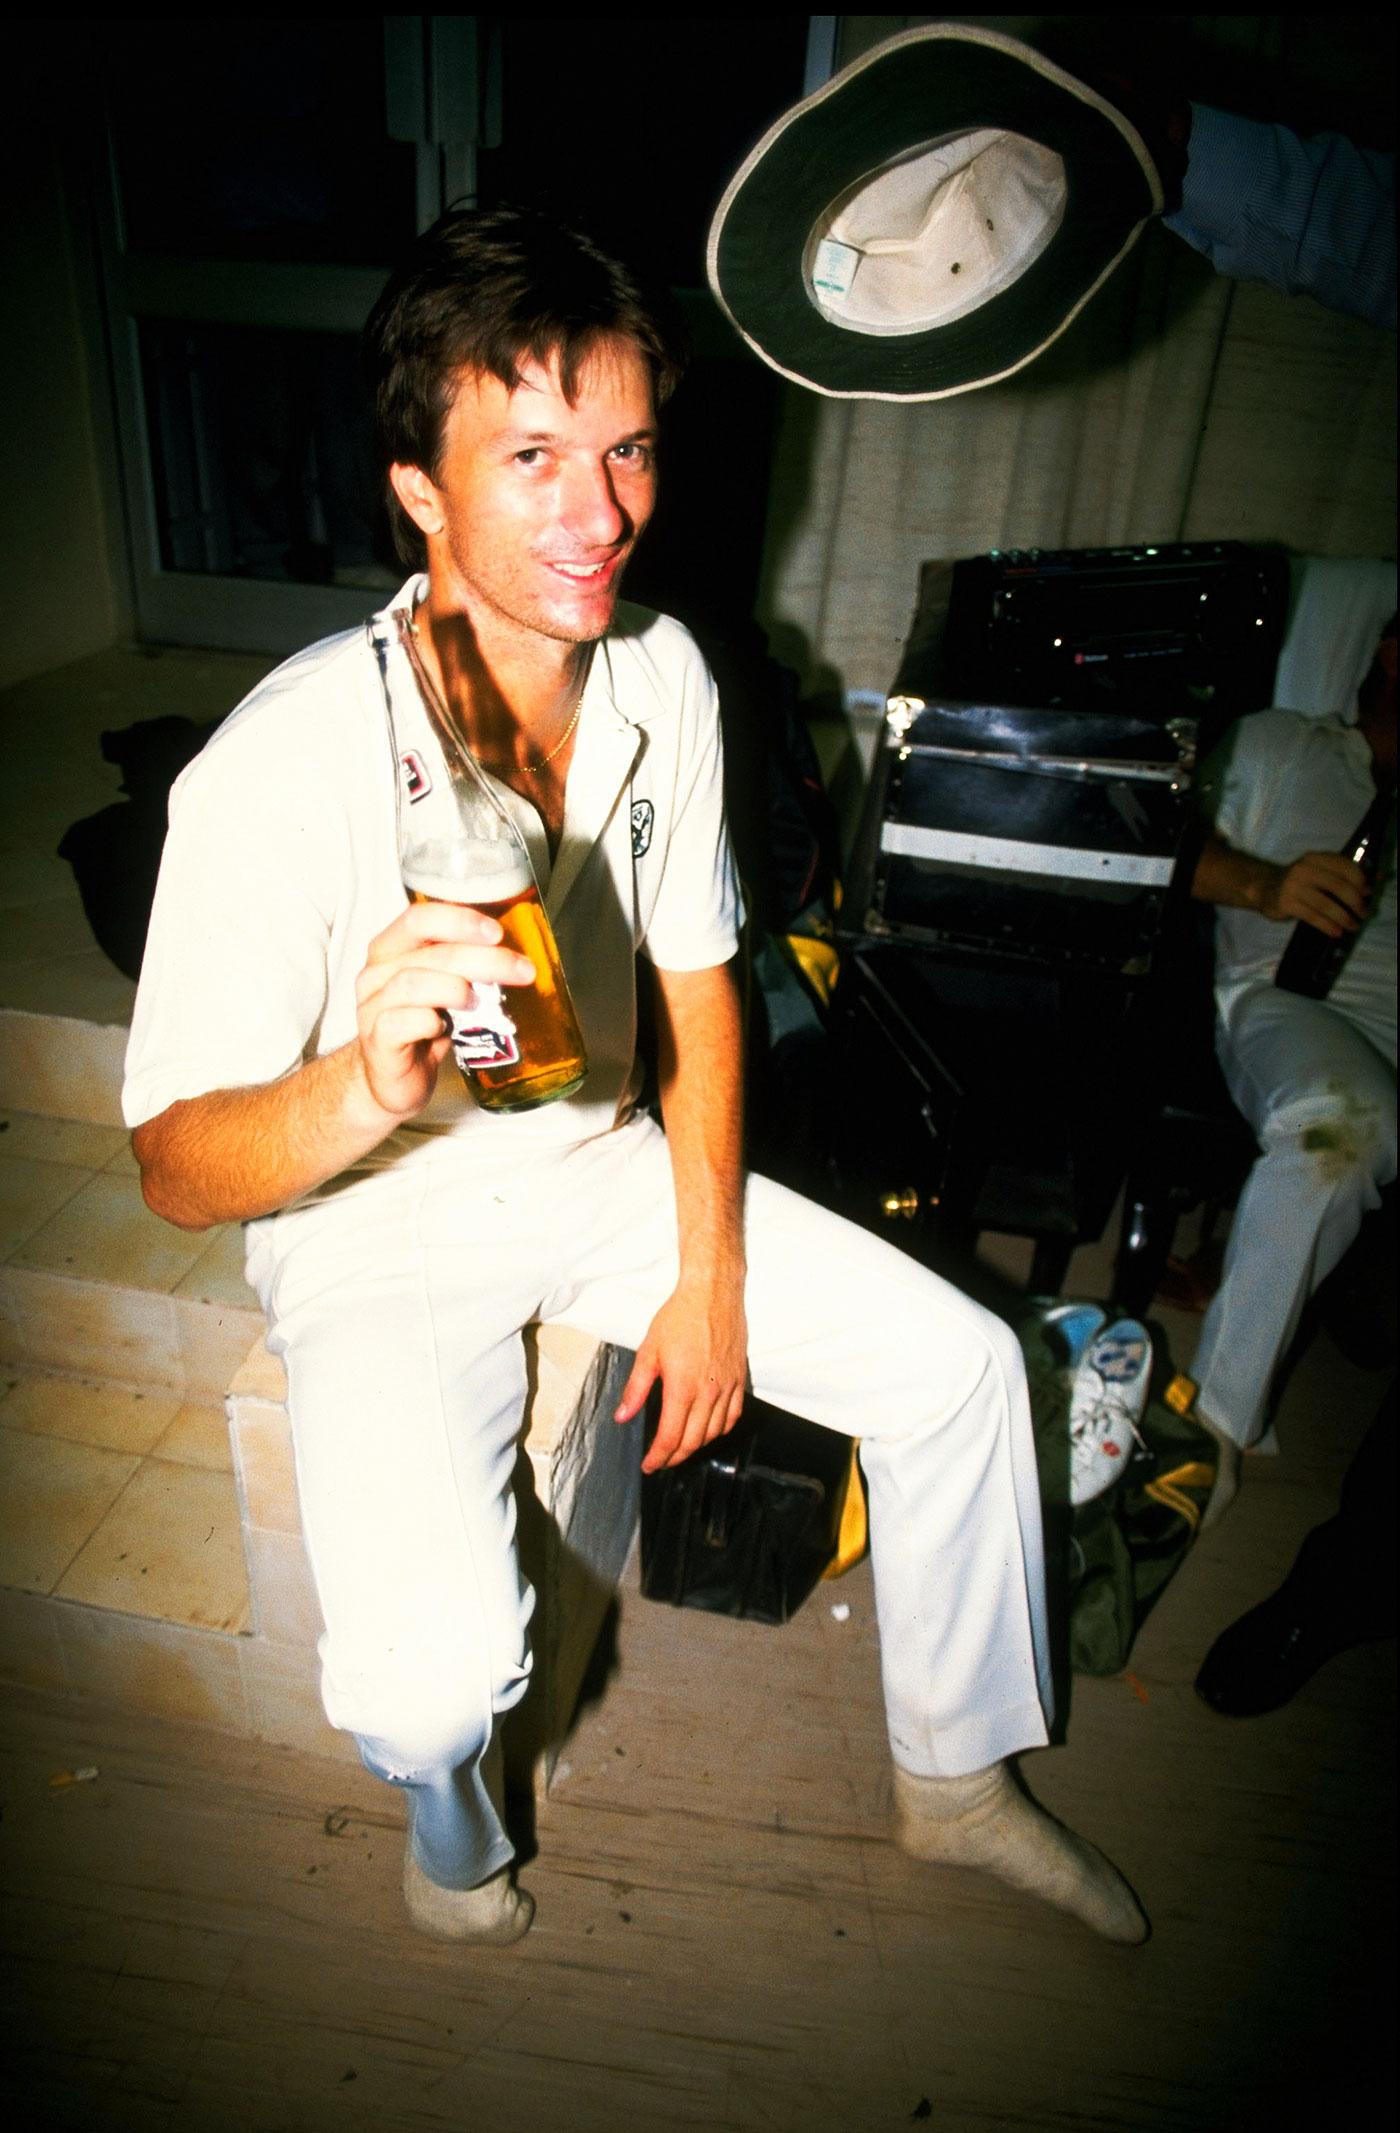 Steve Waugh enjoys a beer after the World Cup final, Australia v England, World Cup, final, Kolkata, November 8, 1987